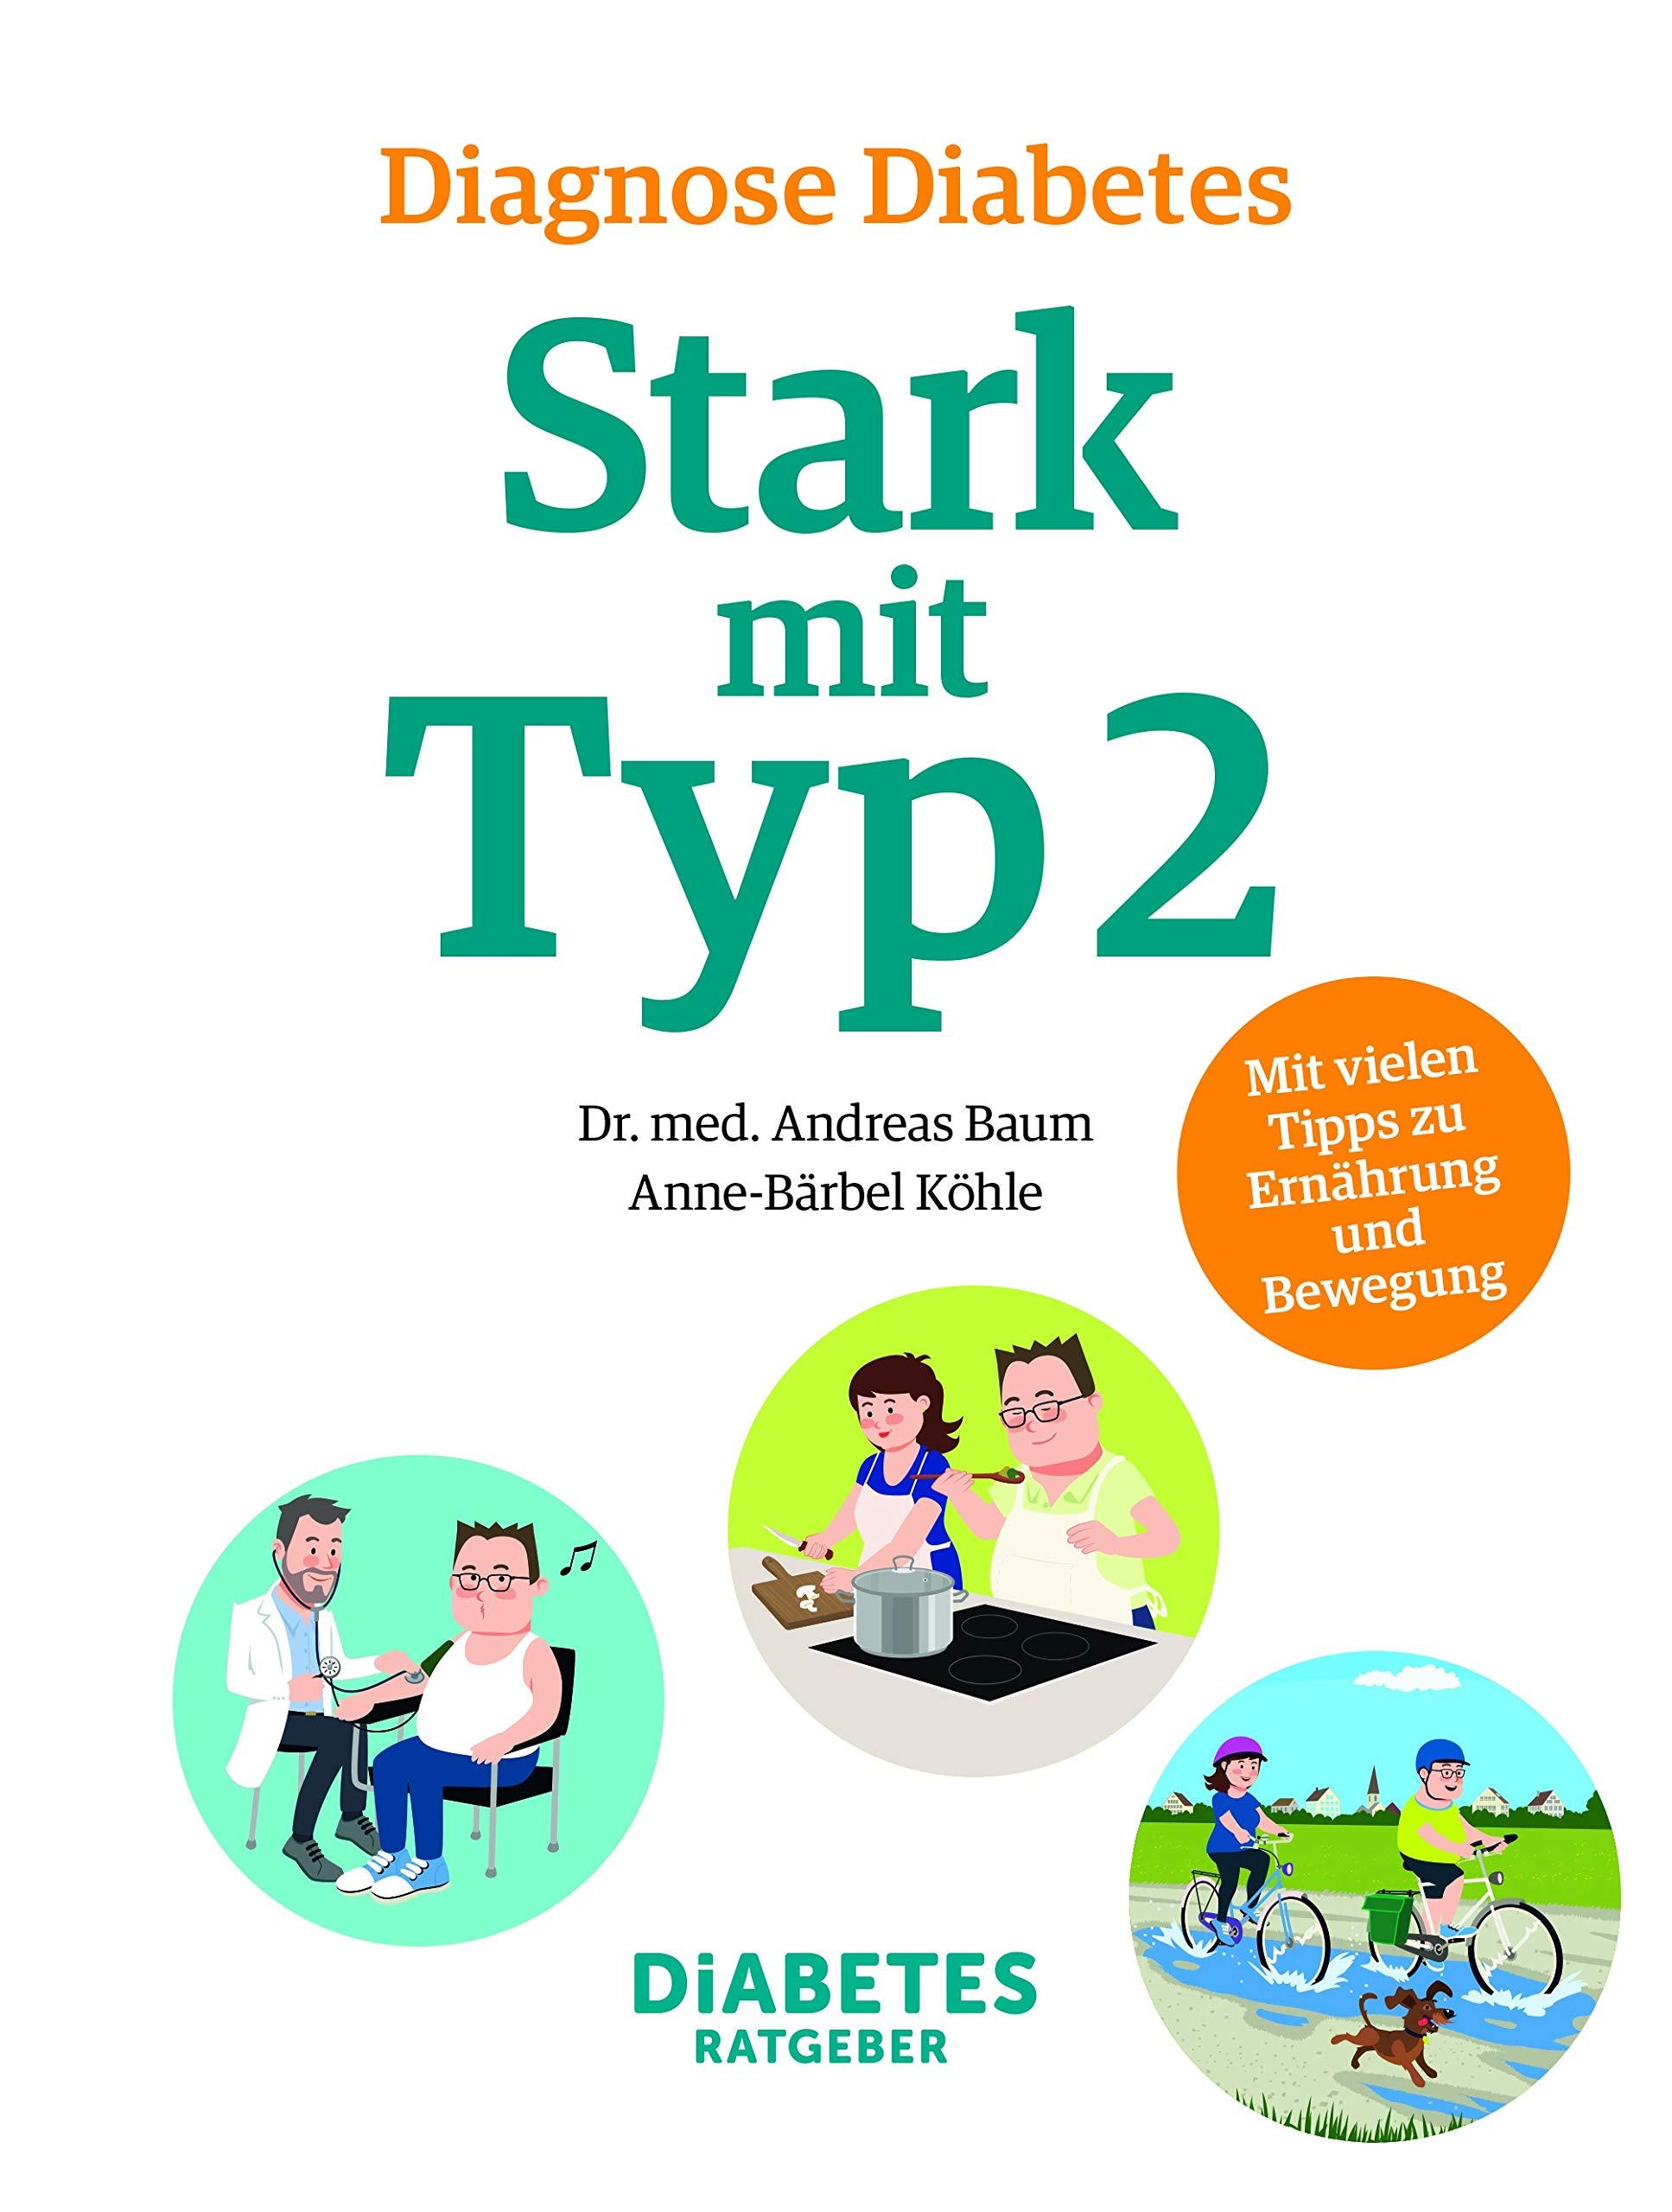 Diagnose Diabetes Stark Mit Typ 2 Becker Dr Med Marc Baum Dr Andreas Köhle Anne Bärbel Müskes Christian Freydank Christian Bücher